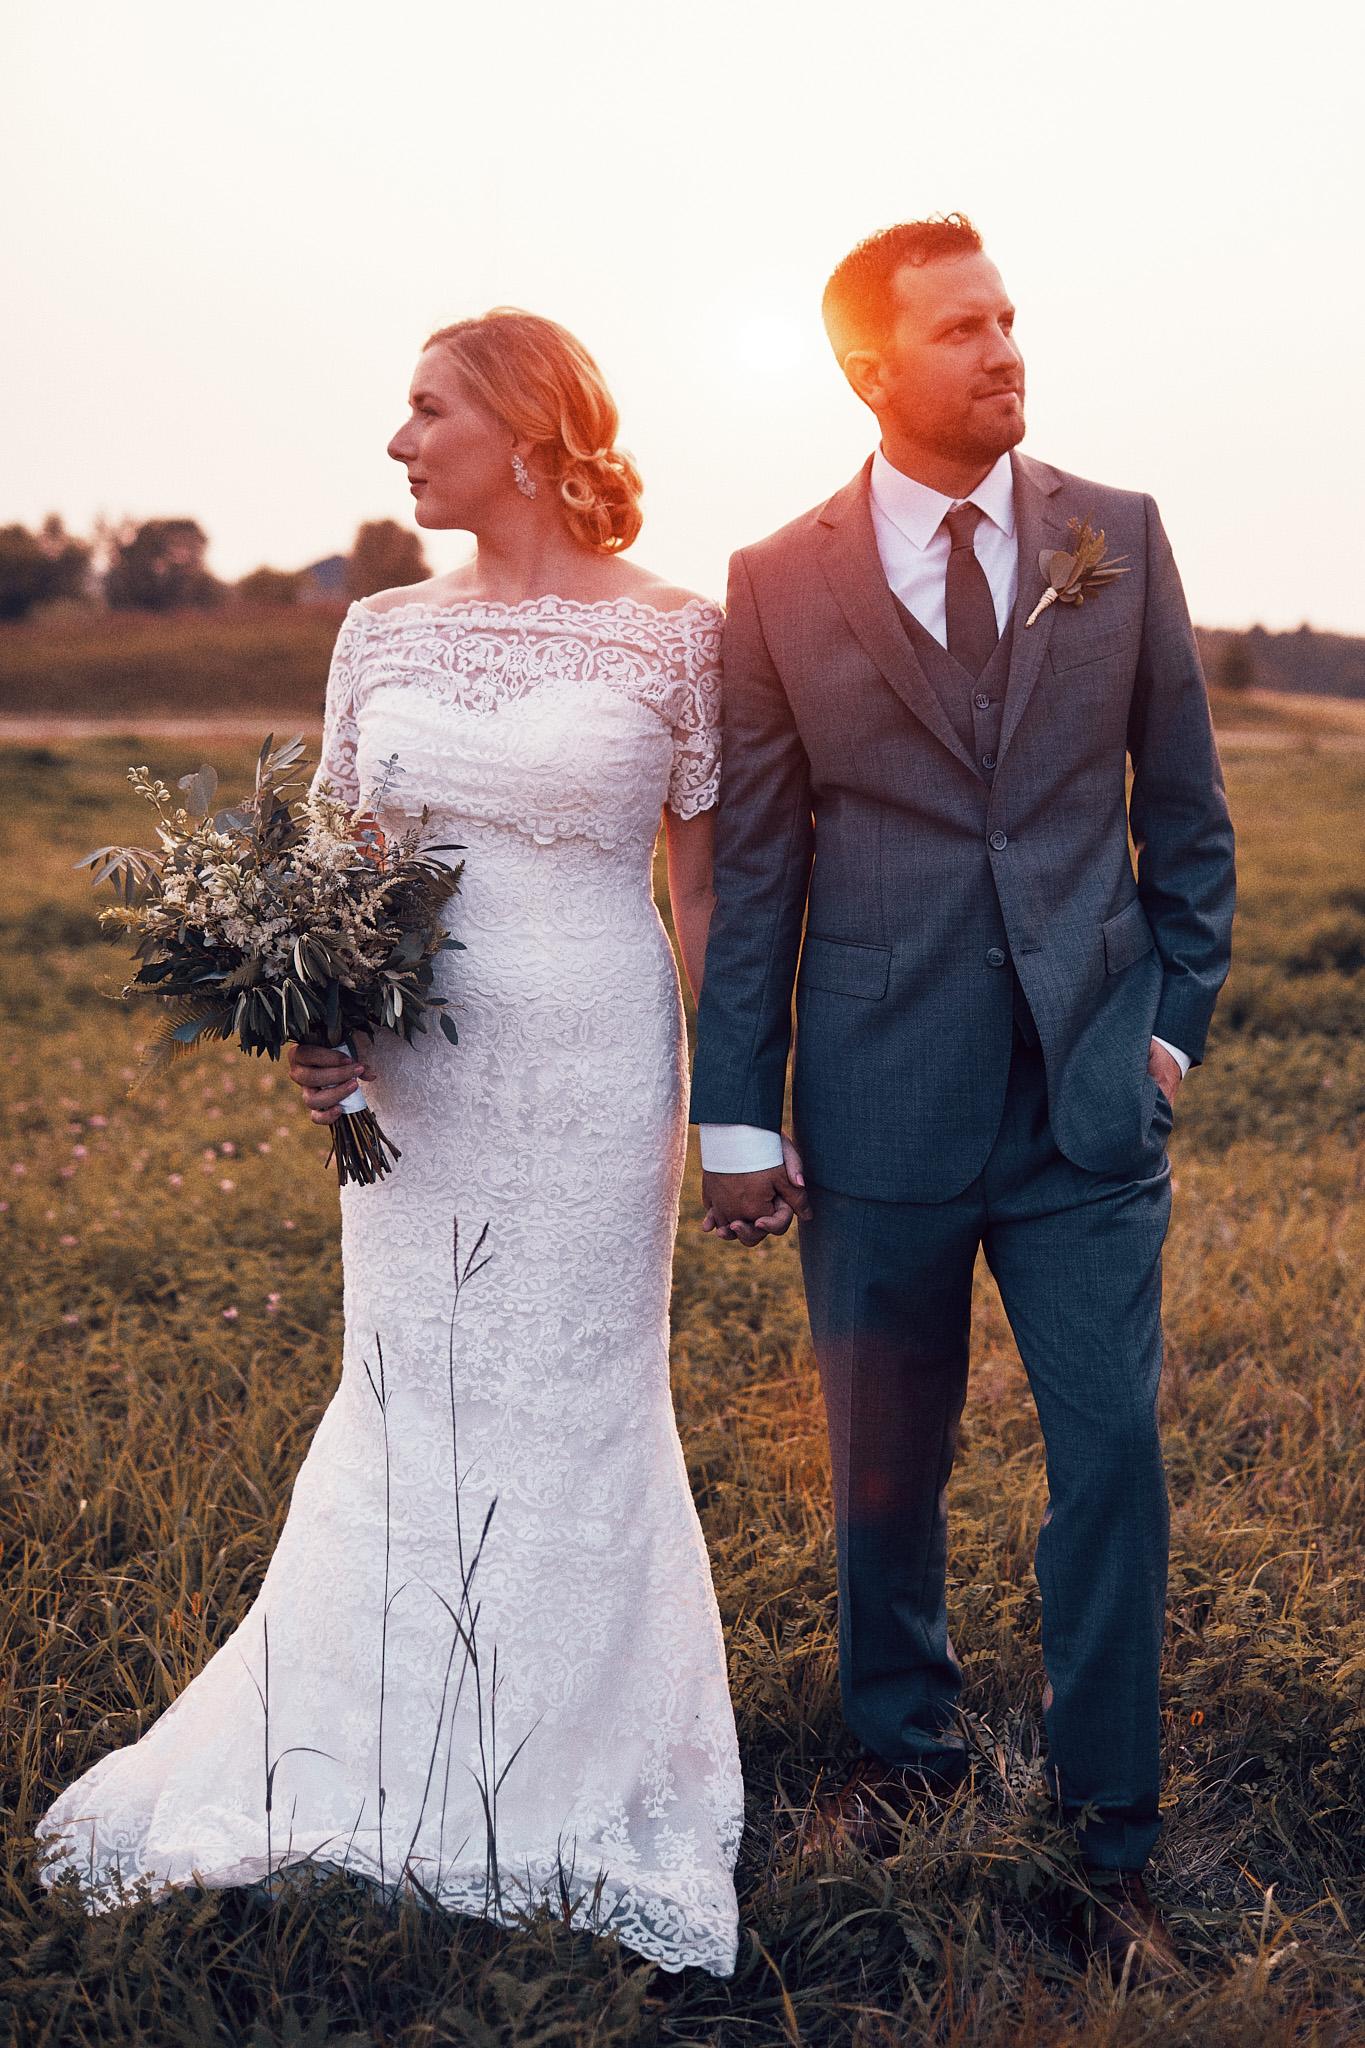 Killer_Field_Golden_Hour_Shot_In_Alexandria_Wedding_Photography_High_End_Minneapolis_Brand_Photographer_Something_Candid_029.JPG